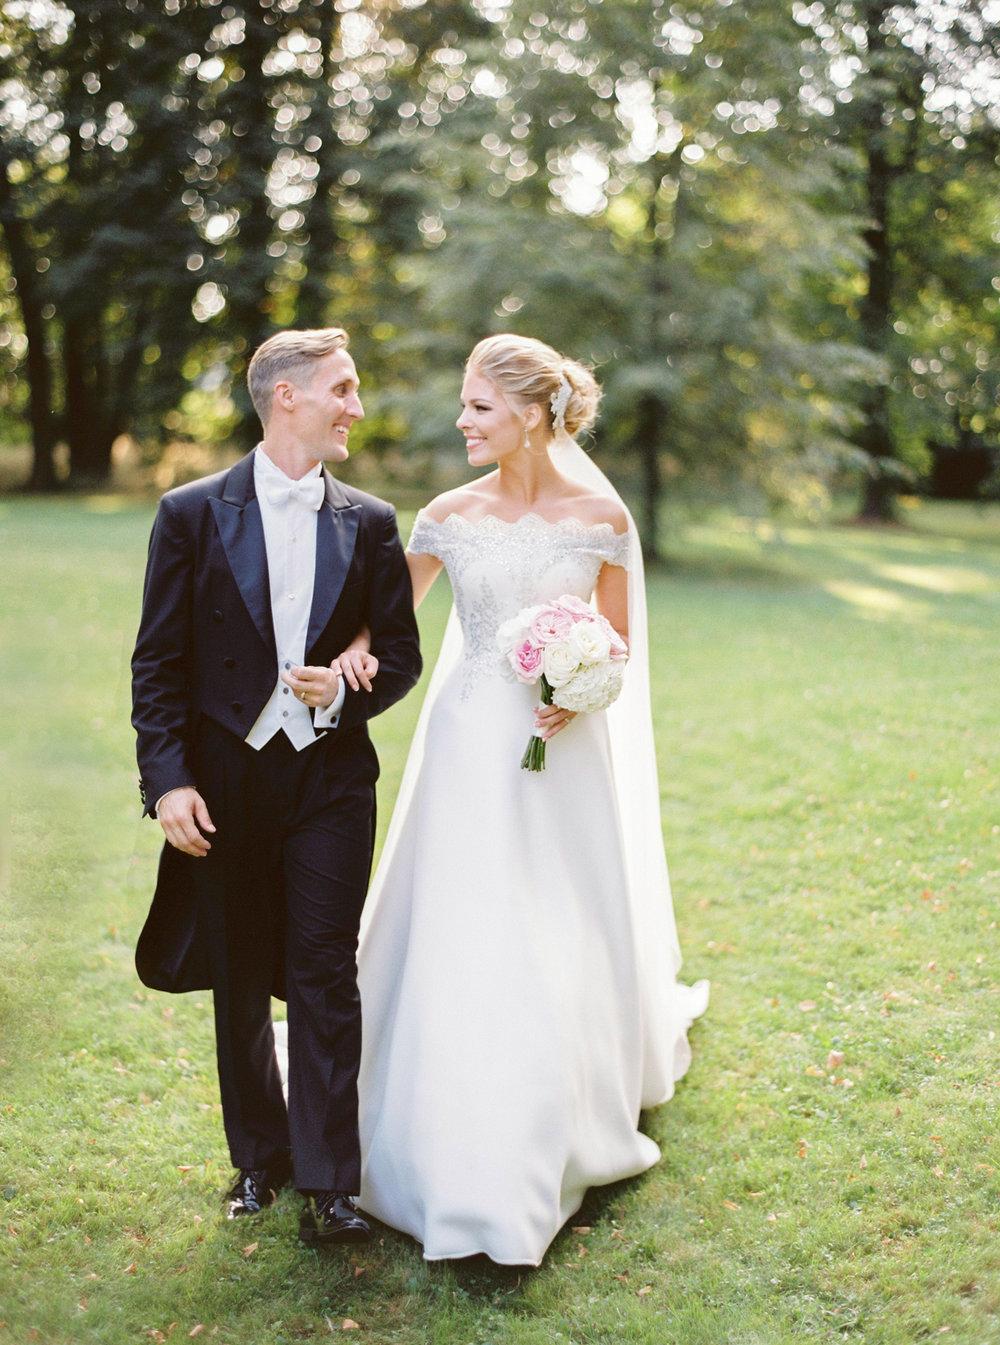 nastia vesna fine art wedding